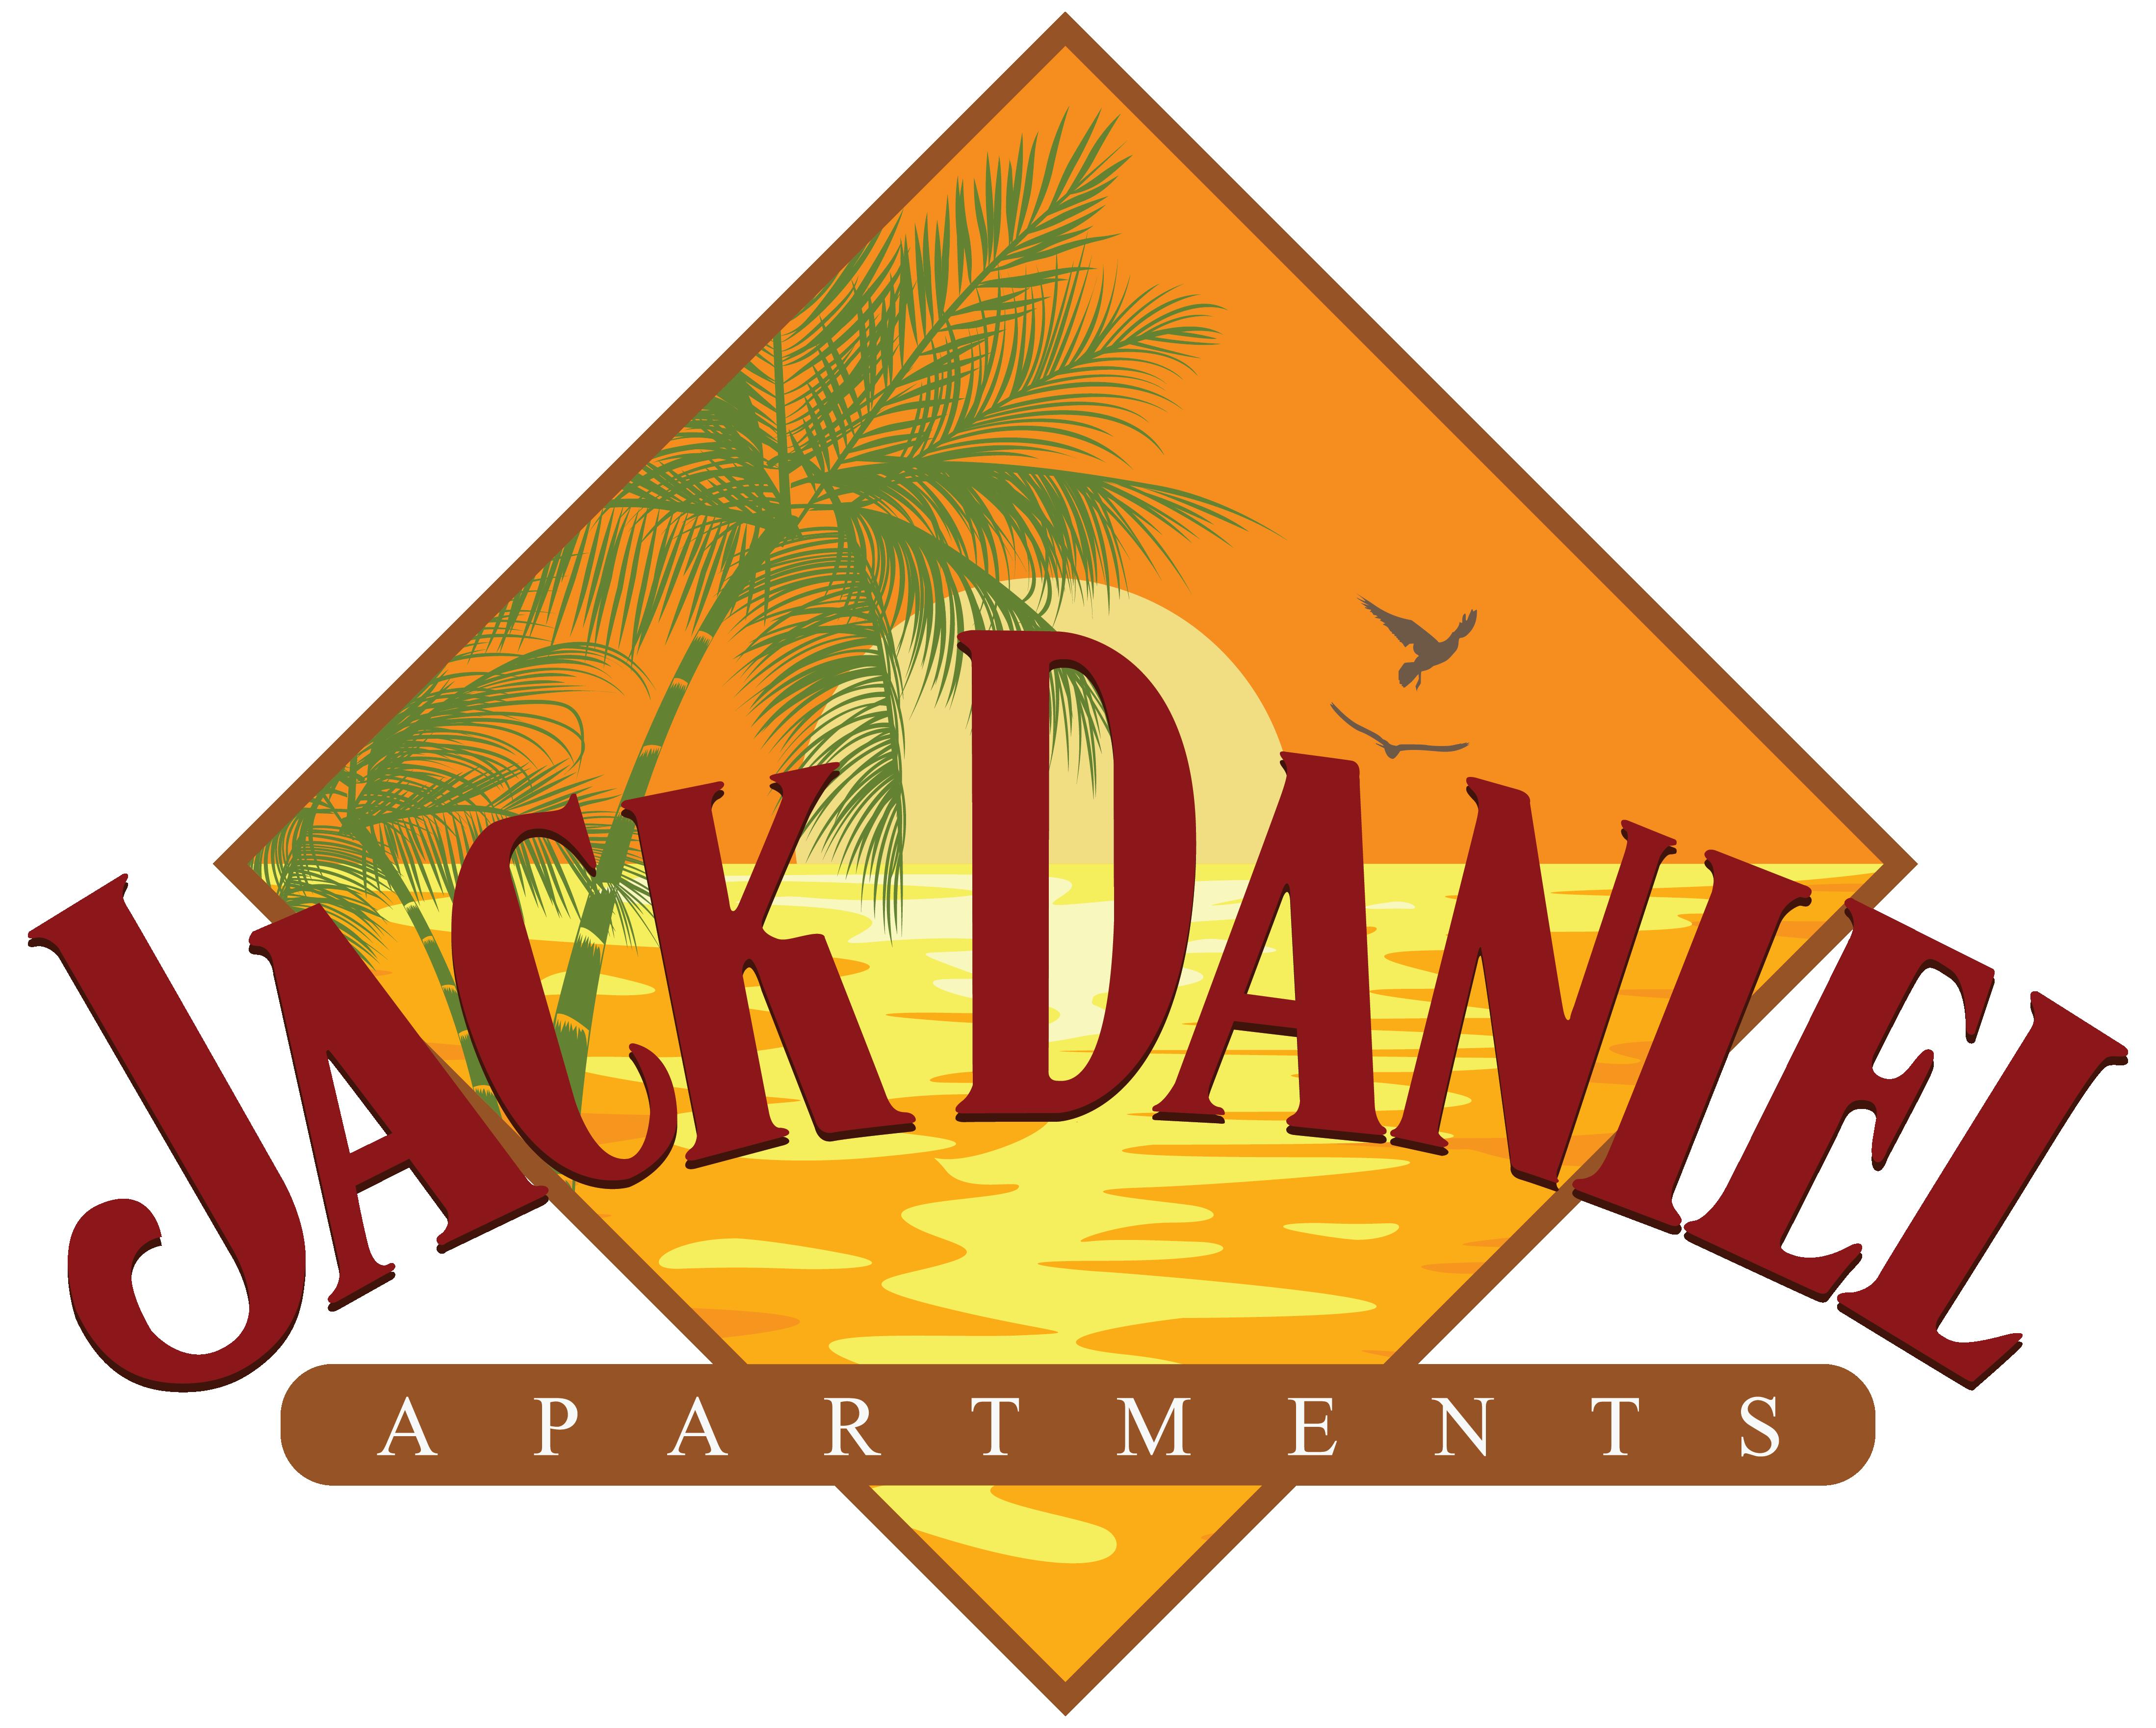 Jack Daniels apartments Logo png #1321 - Free Transparent ... Jack Daniels Logo Png